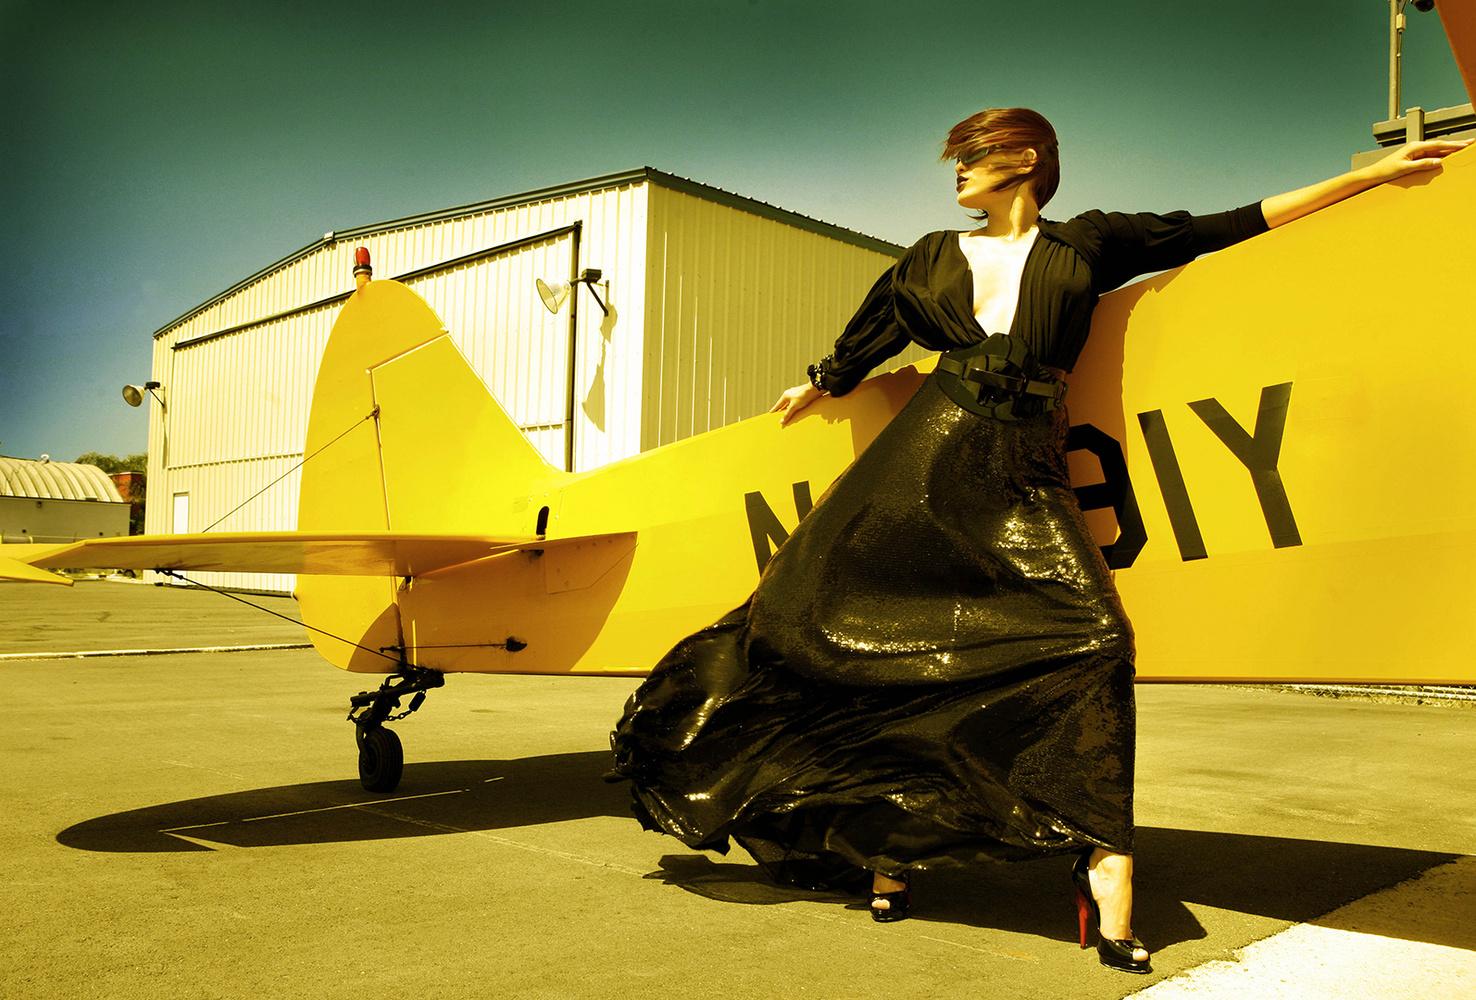 JetSet  by Rosario Fernandez